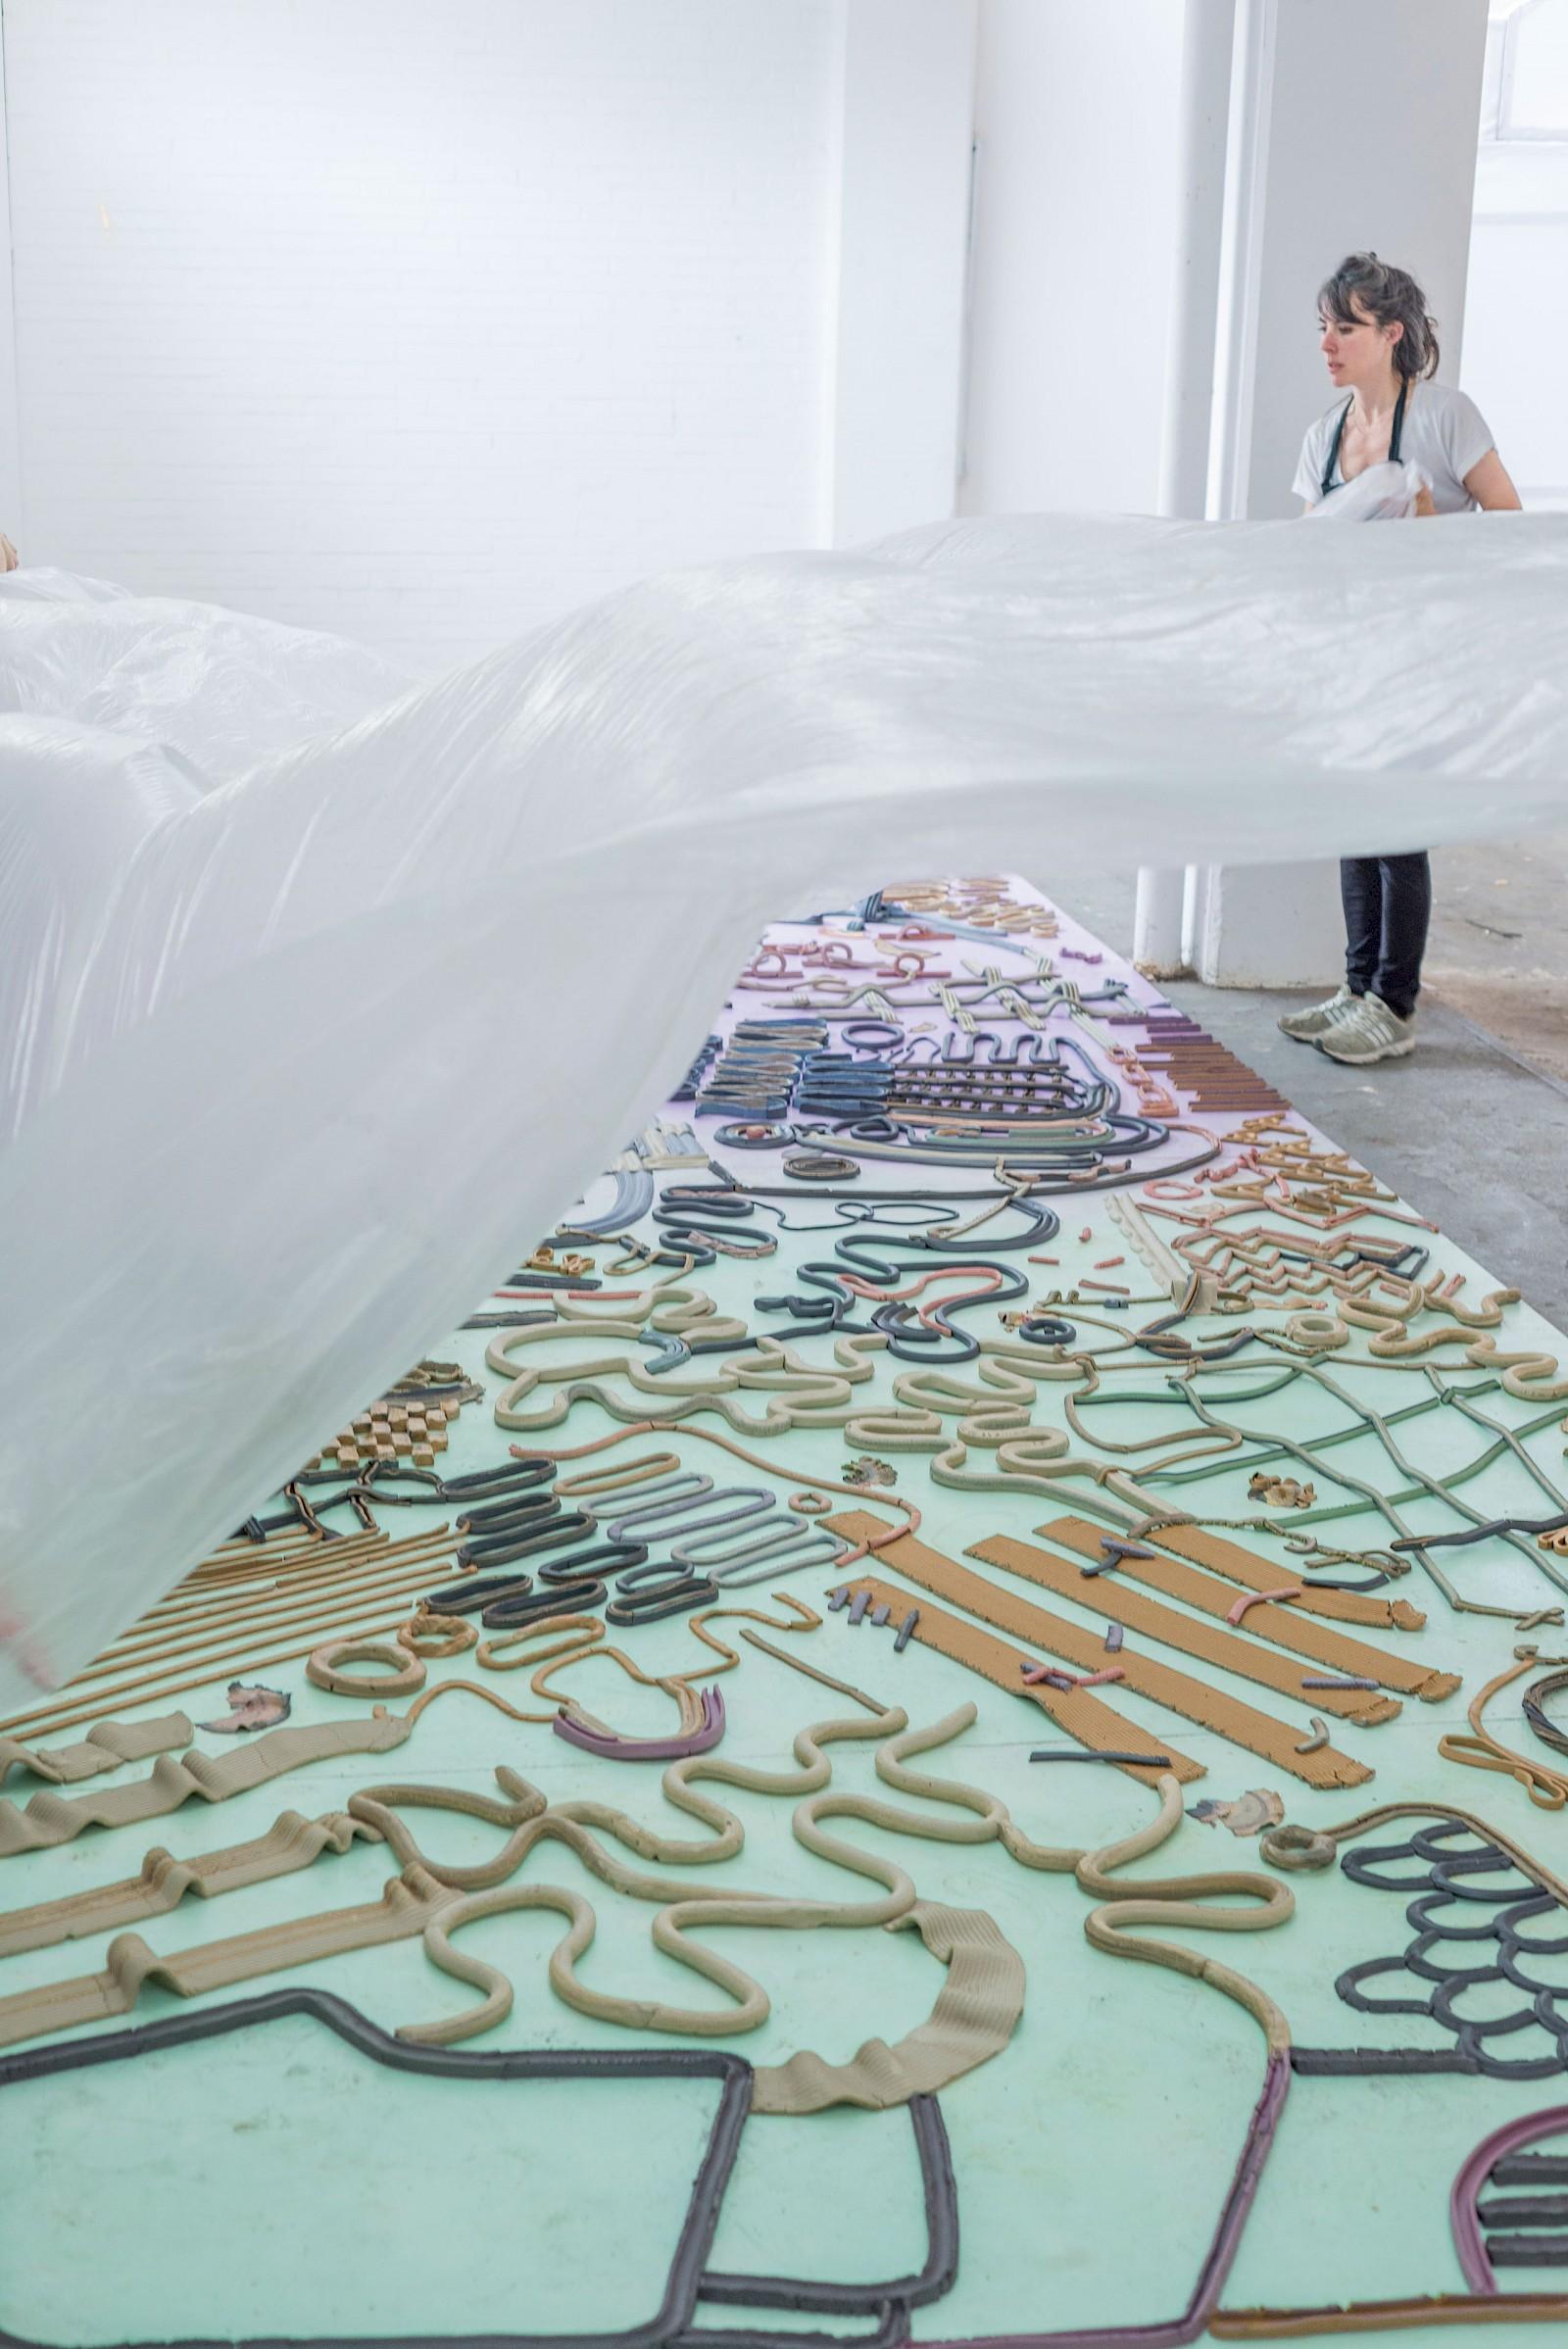 Image - 5 x 2m ephemeral clay flooring (unfired clay)